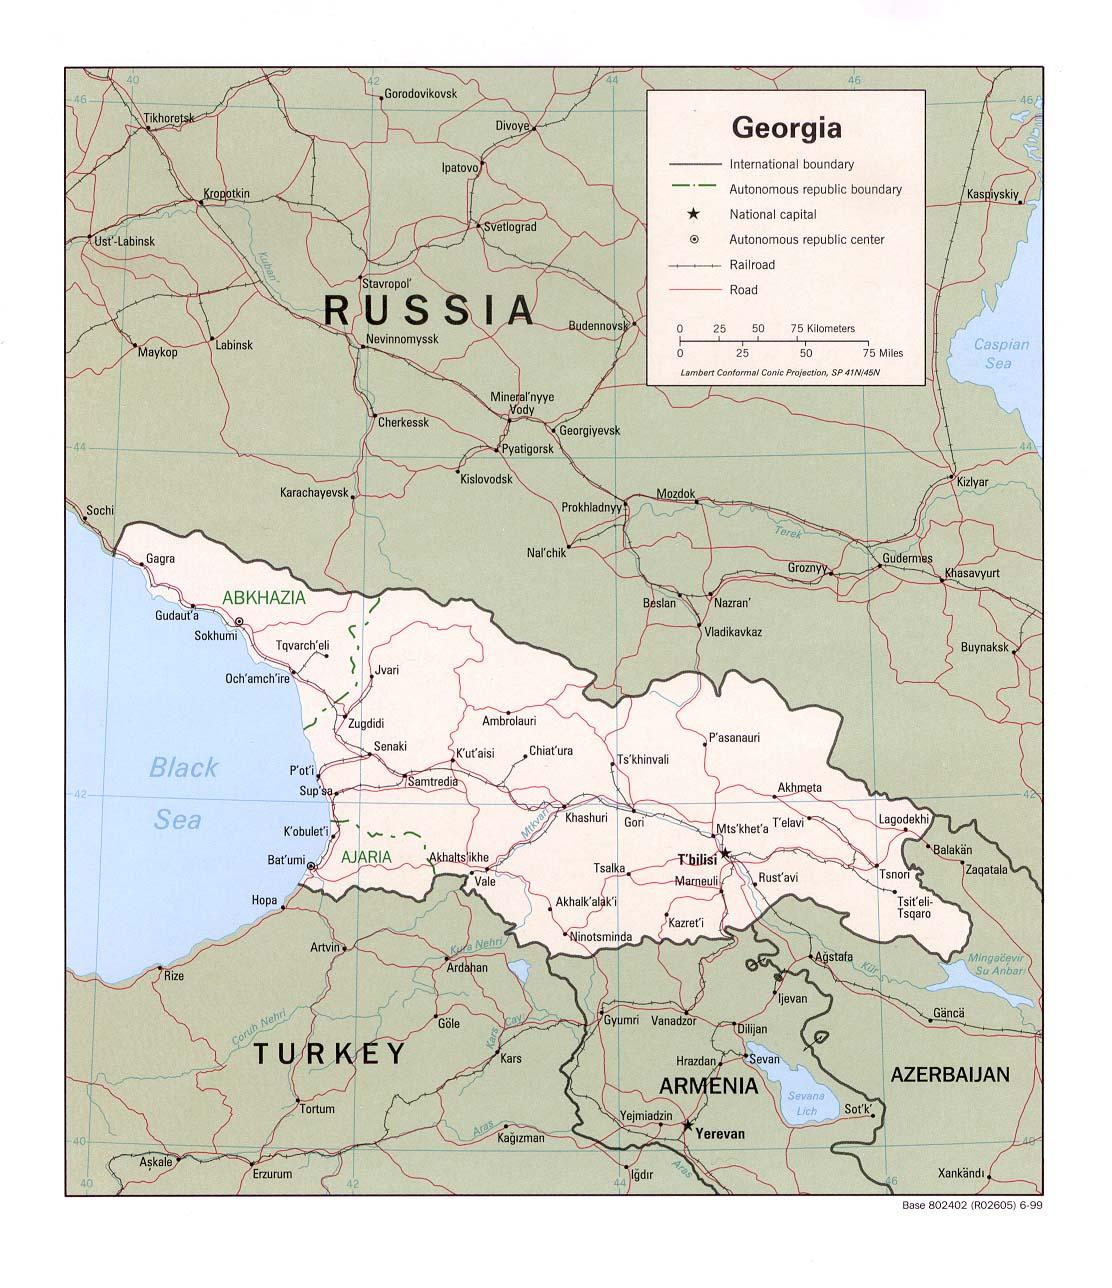 Georgien Karte.Landkarte Georgien Politische Karte Weltkarte Com Karten Und